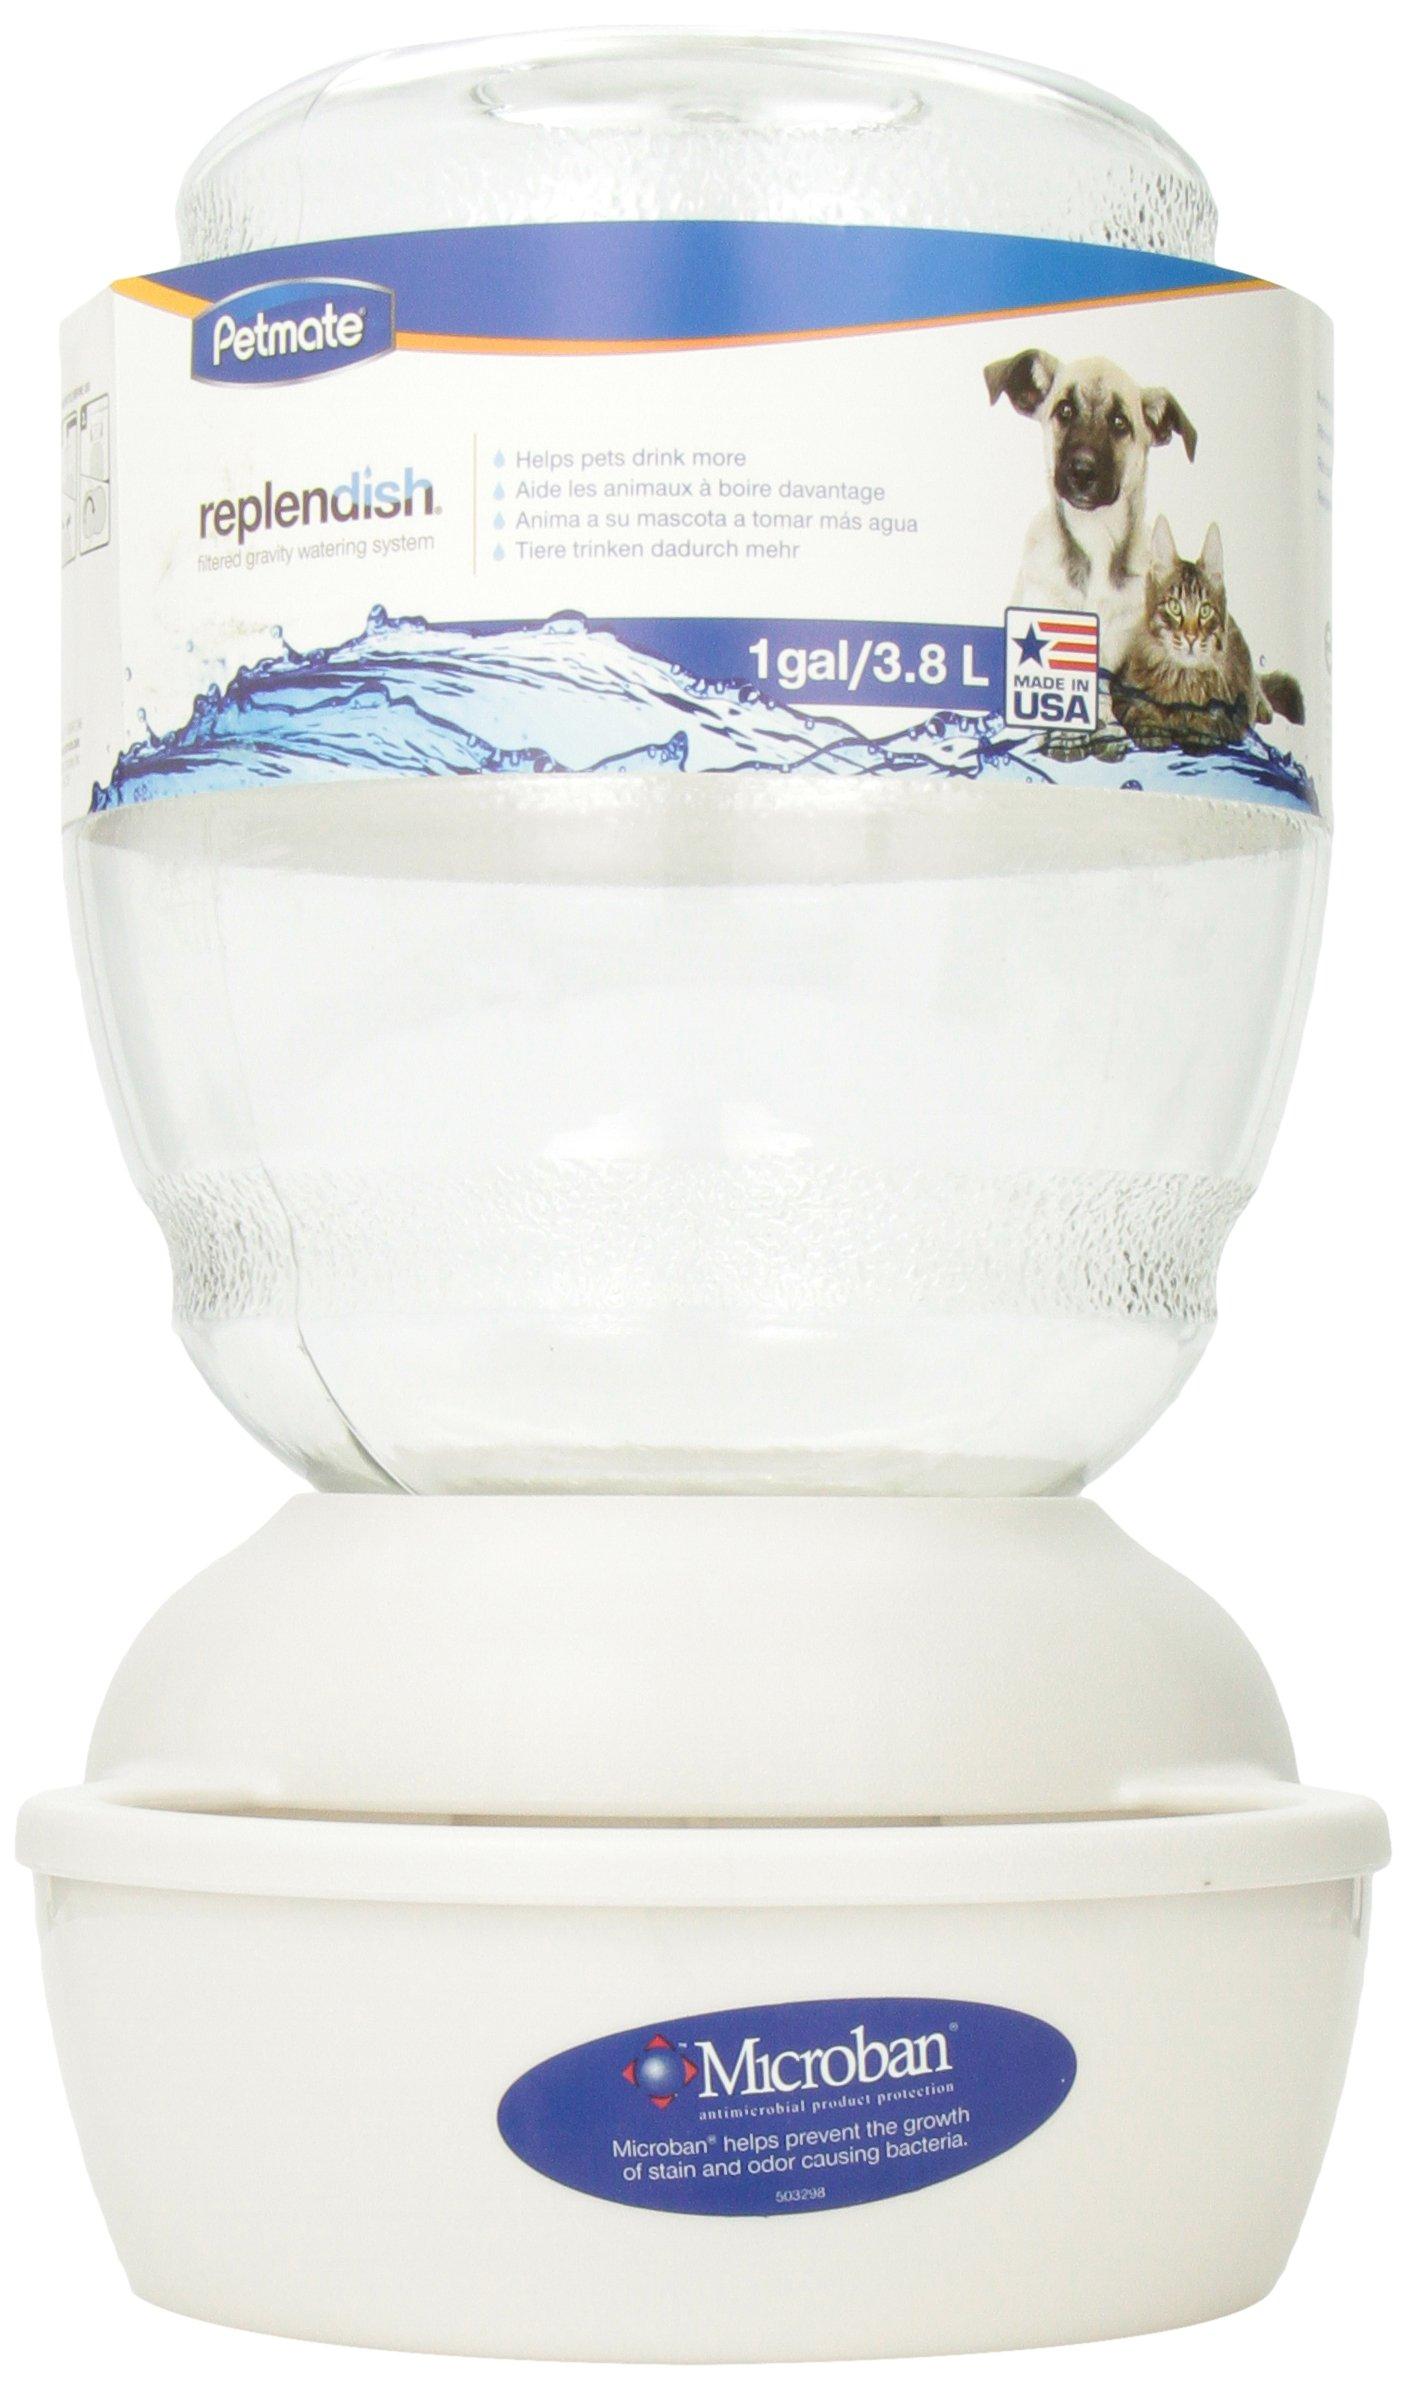 Petmate Replendish Gravity Waterer w/ Microban Pearl White 1 GAL